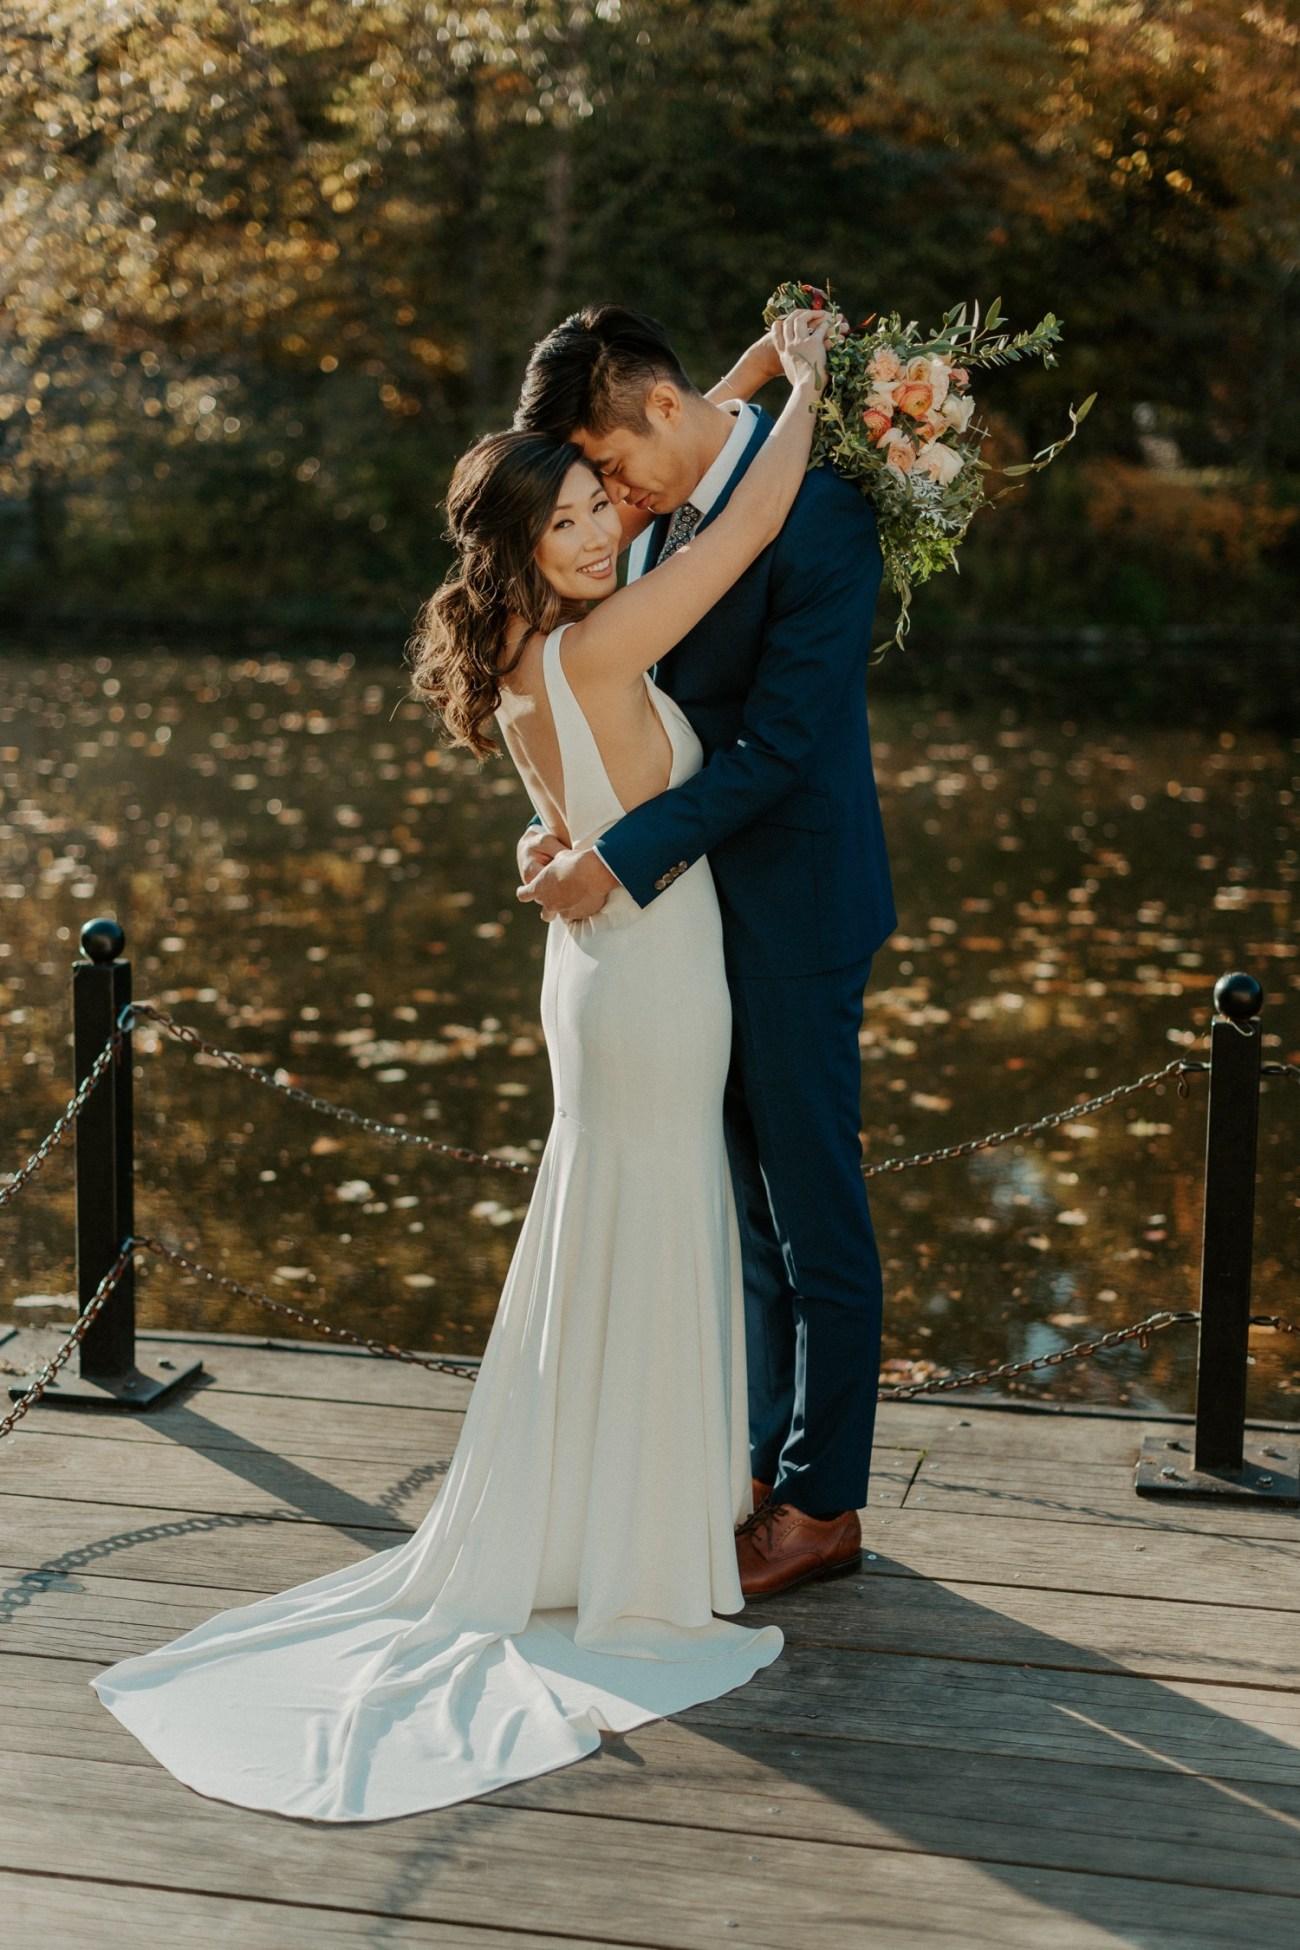 Prospect Park Brooklyn Wedding Fall Wedding In NYC New York Wedding Photographer Anais Possamai Photography 02